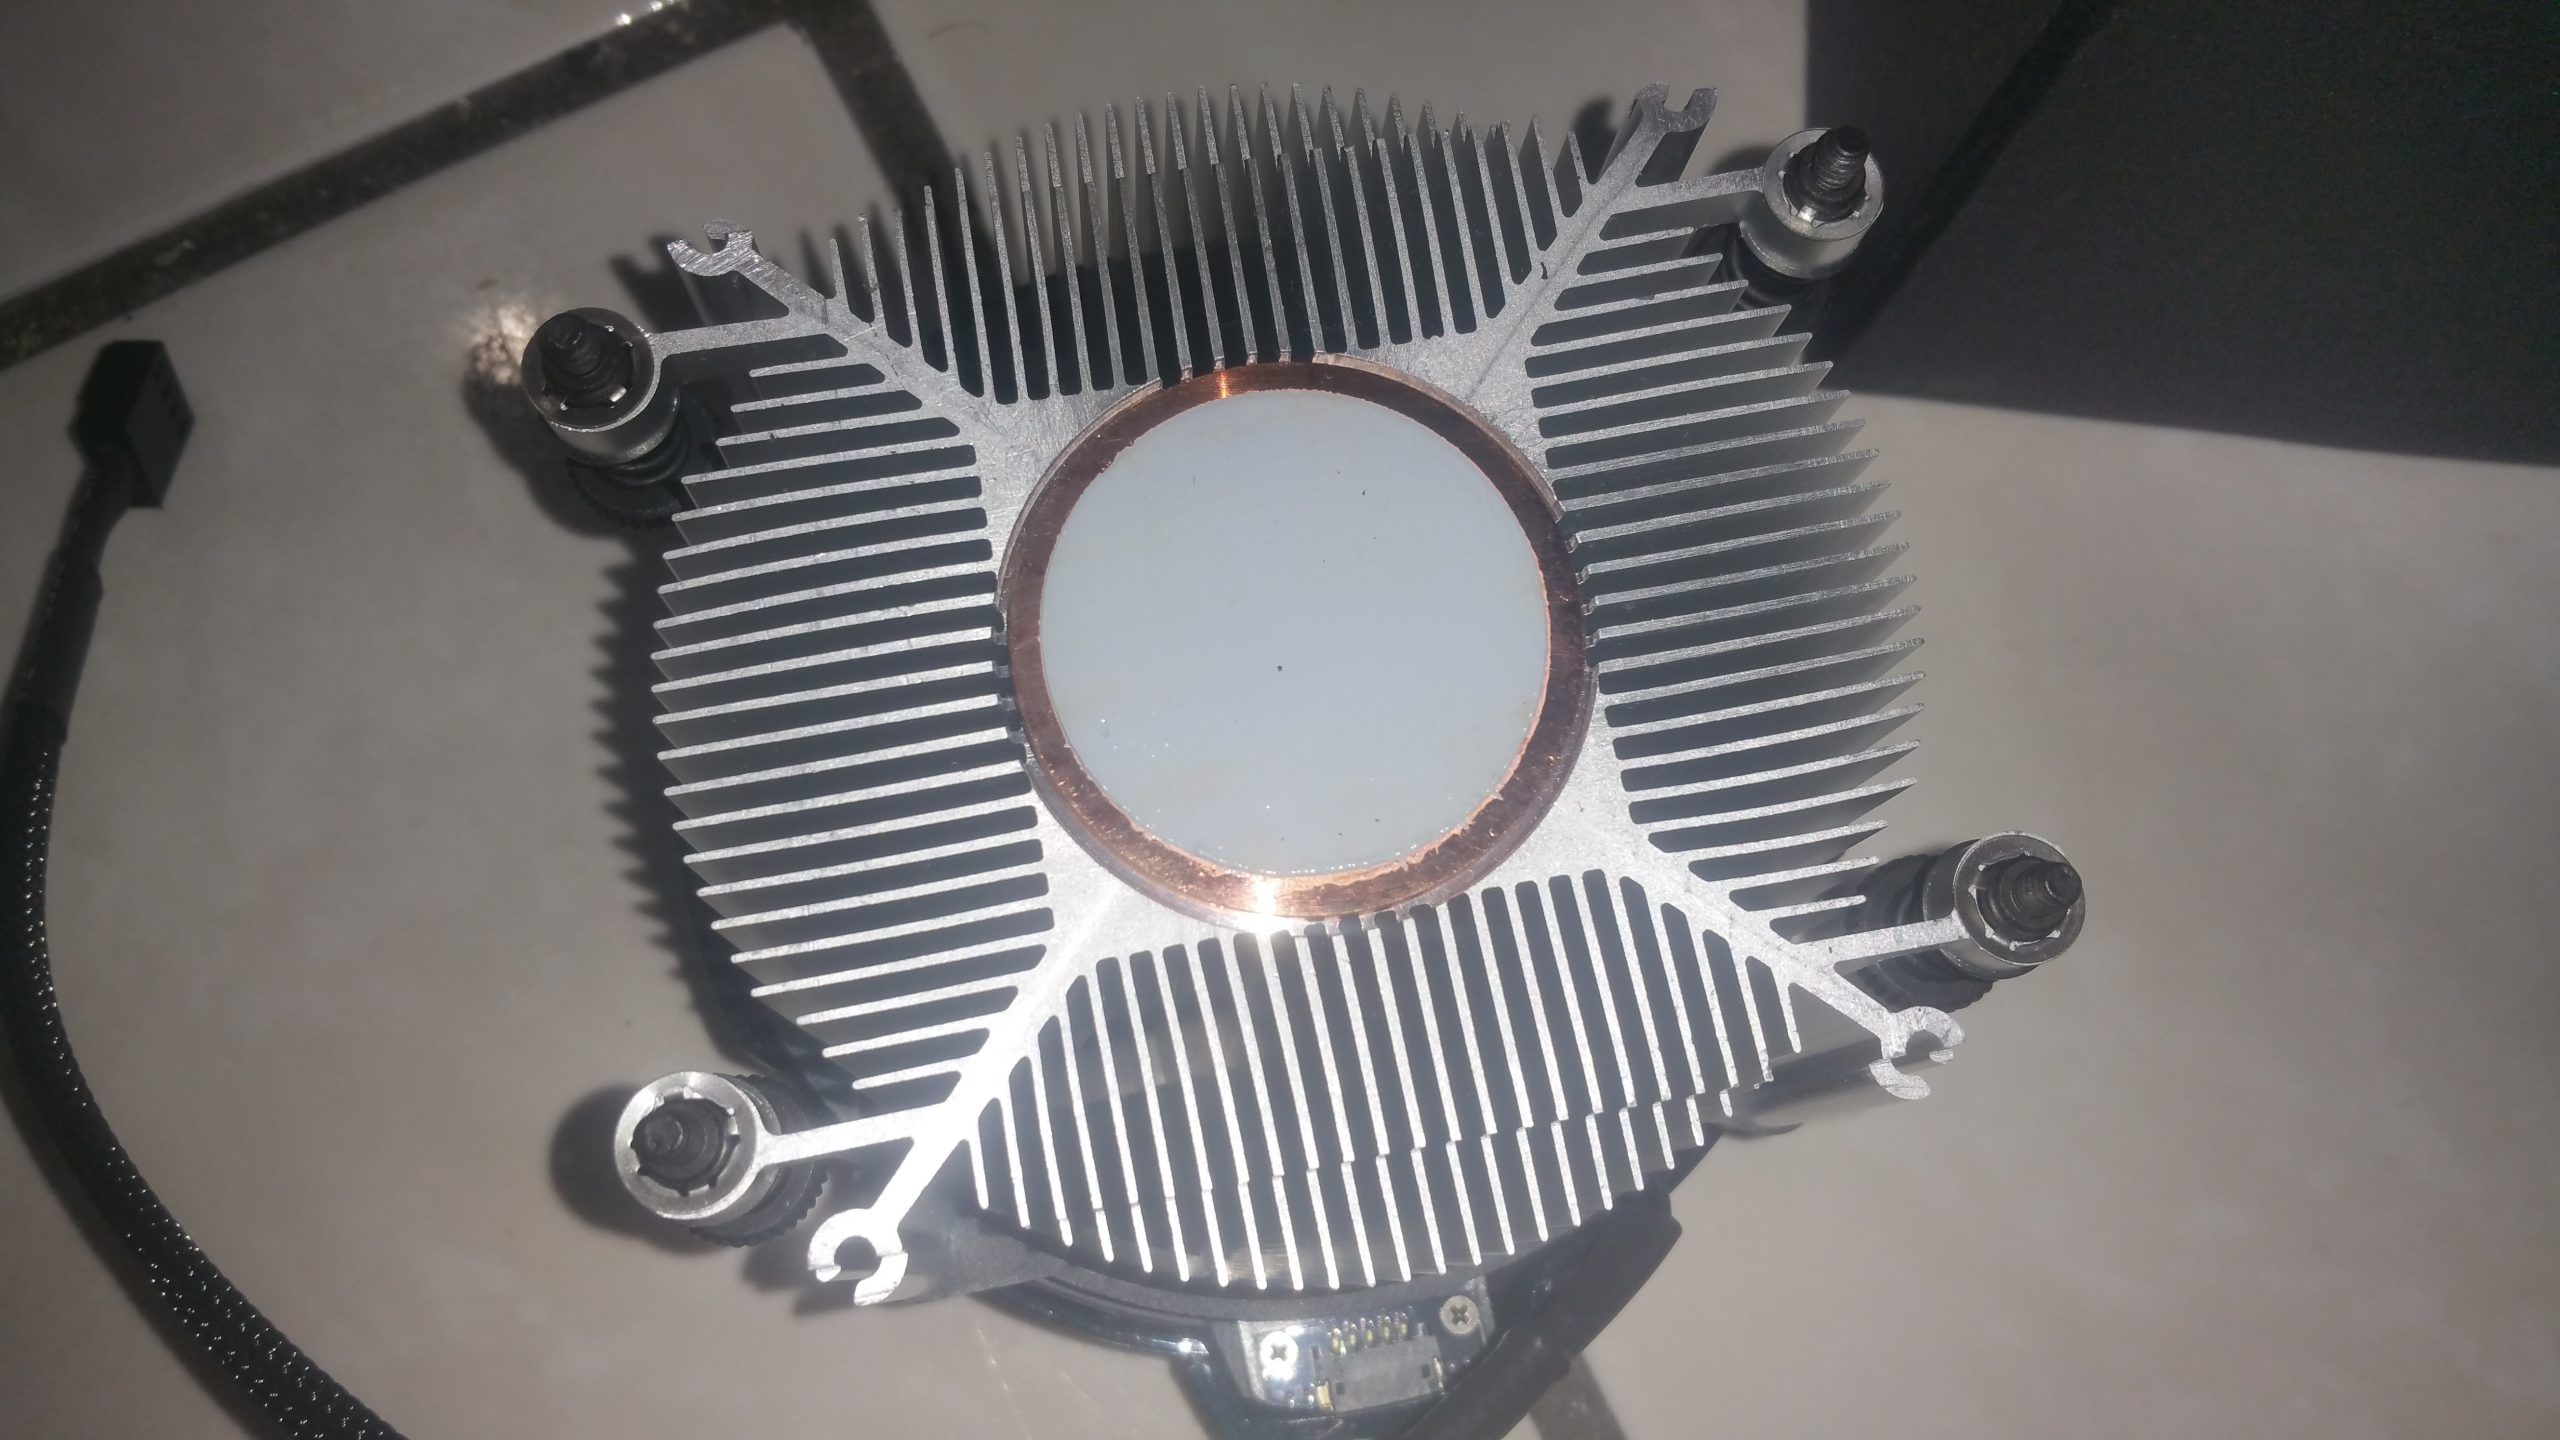 AMD Ryzen 7 1700 CPU 4